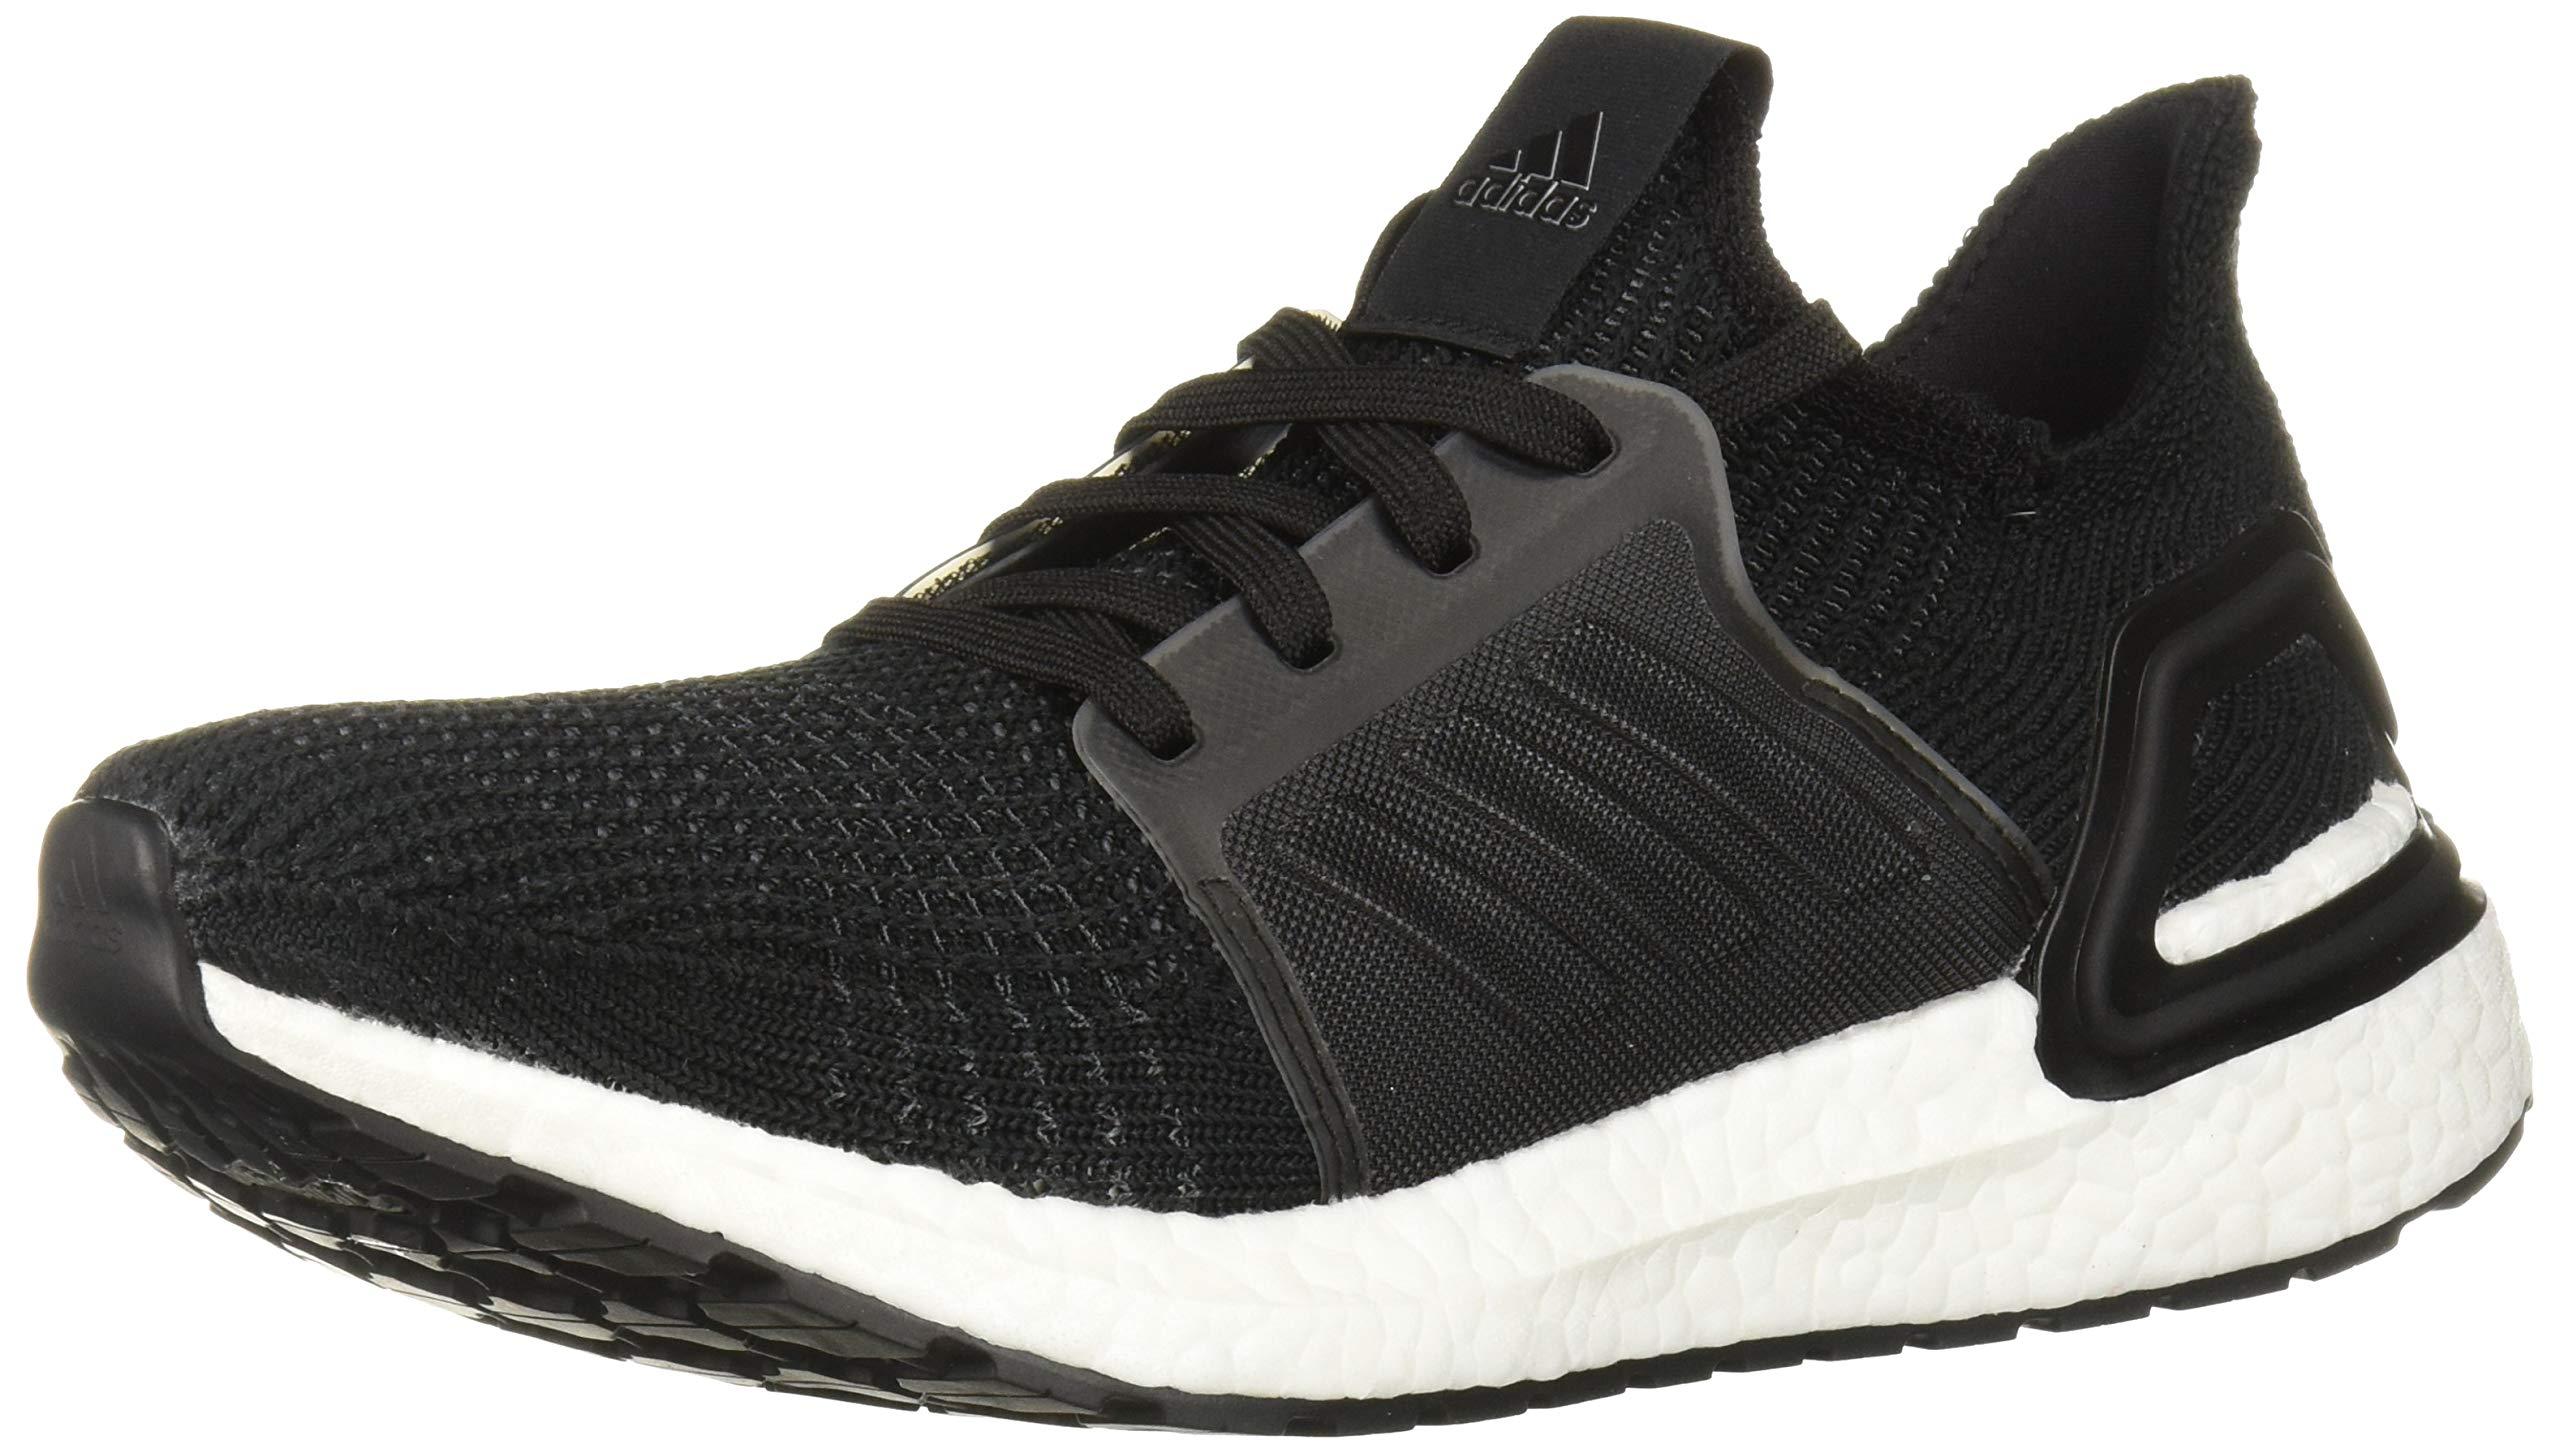 adidas Women's Ultraboost 19 Running Shoe, Black/Grey/Solar Orange, 8.5 M US by adidas